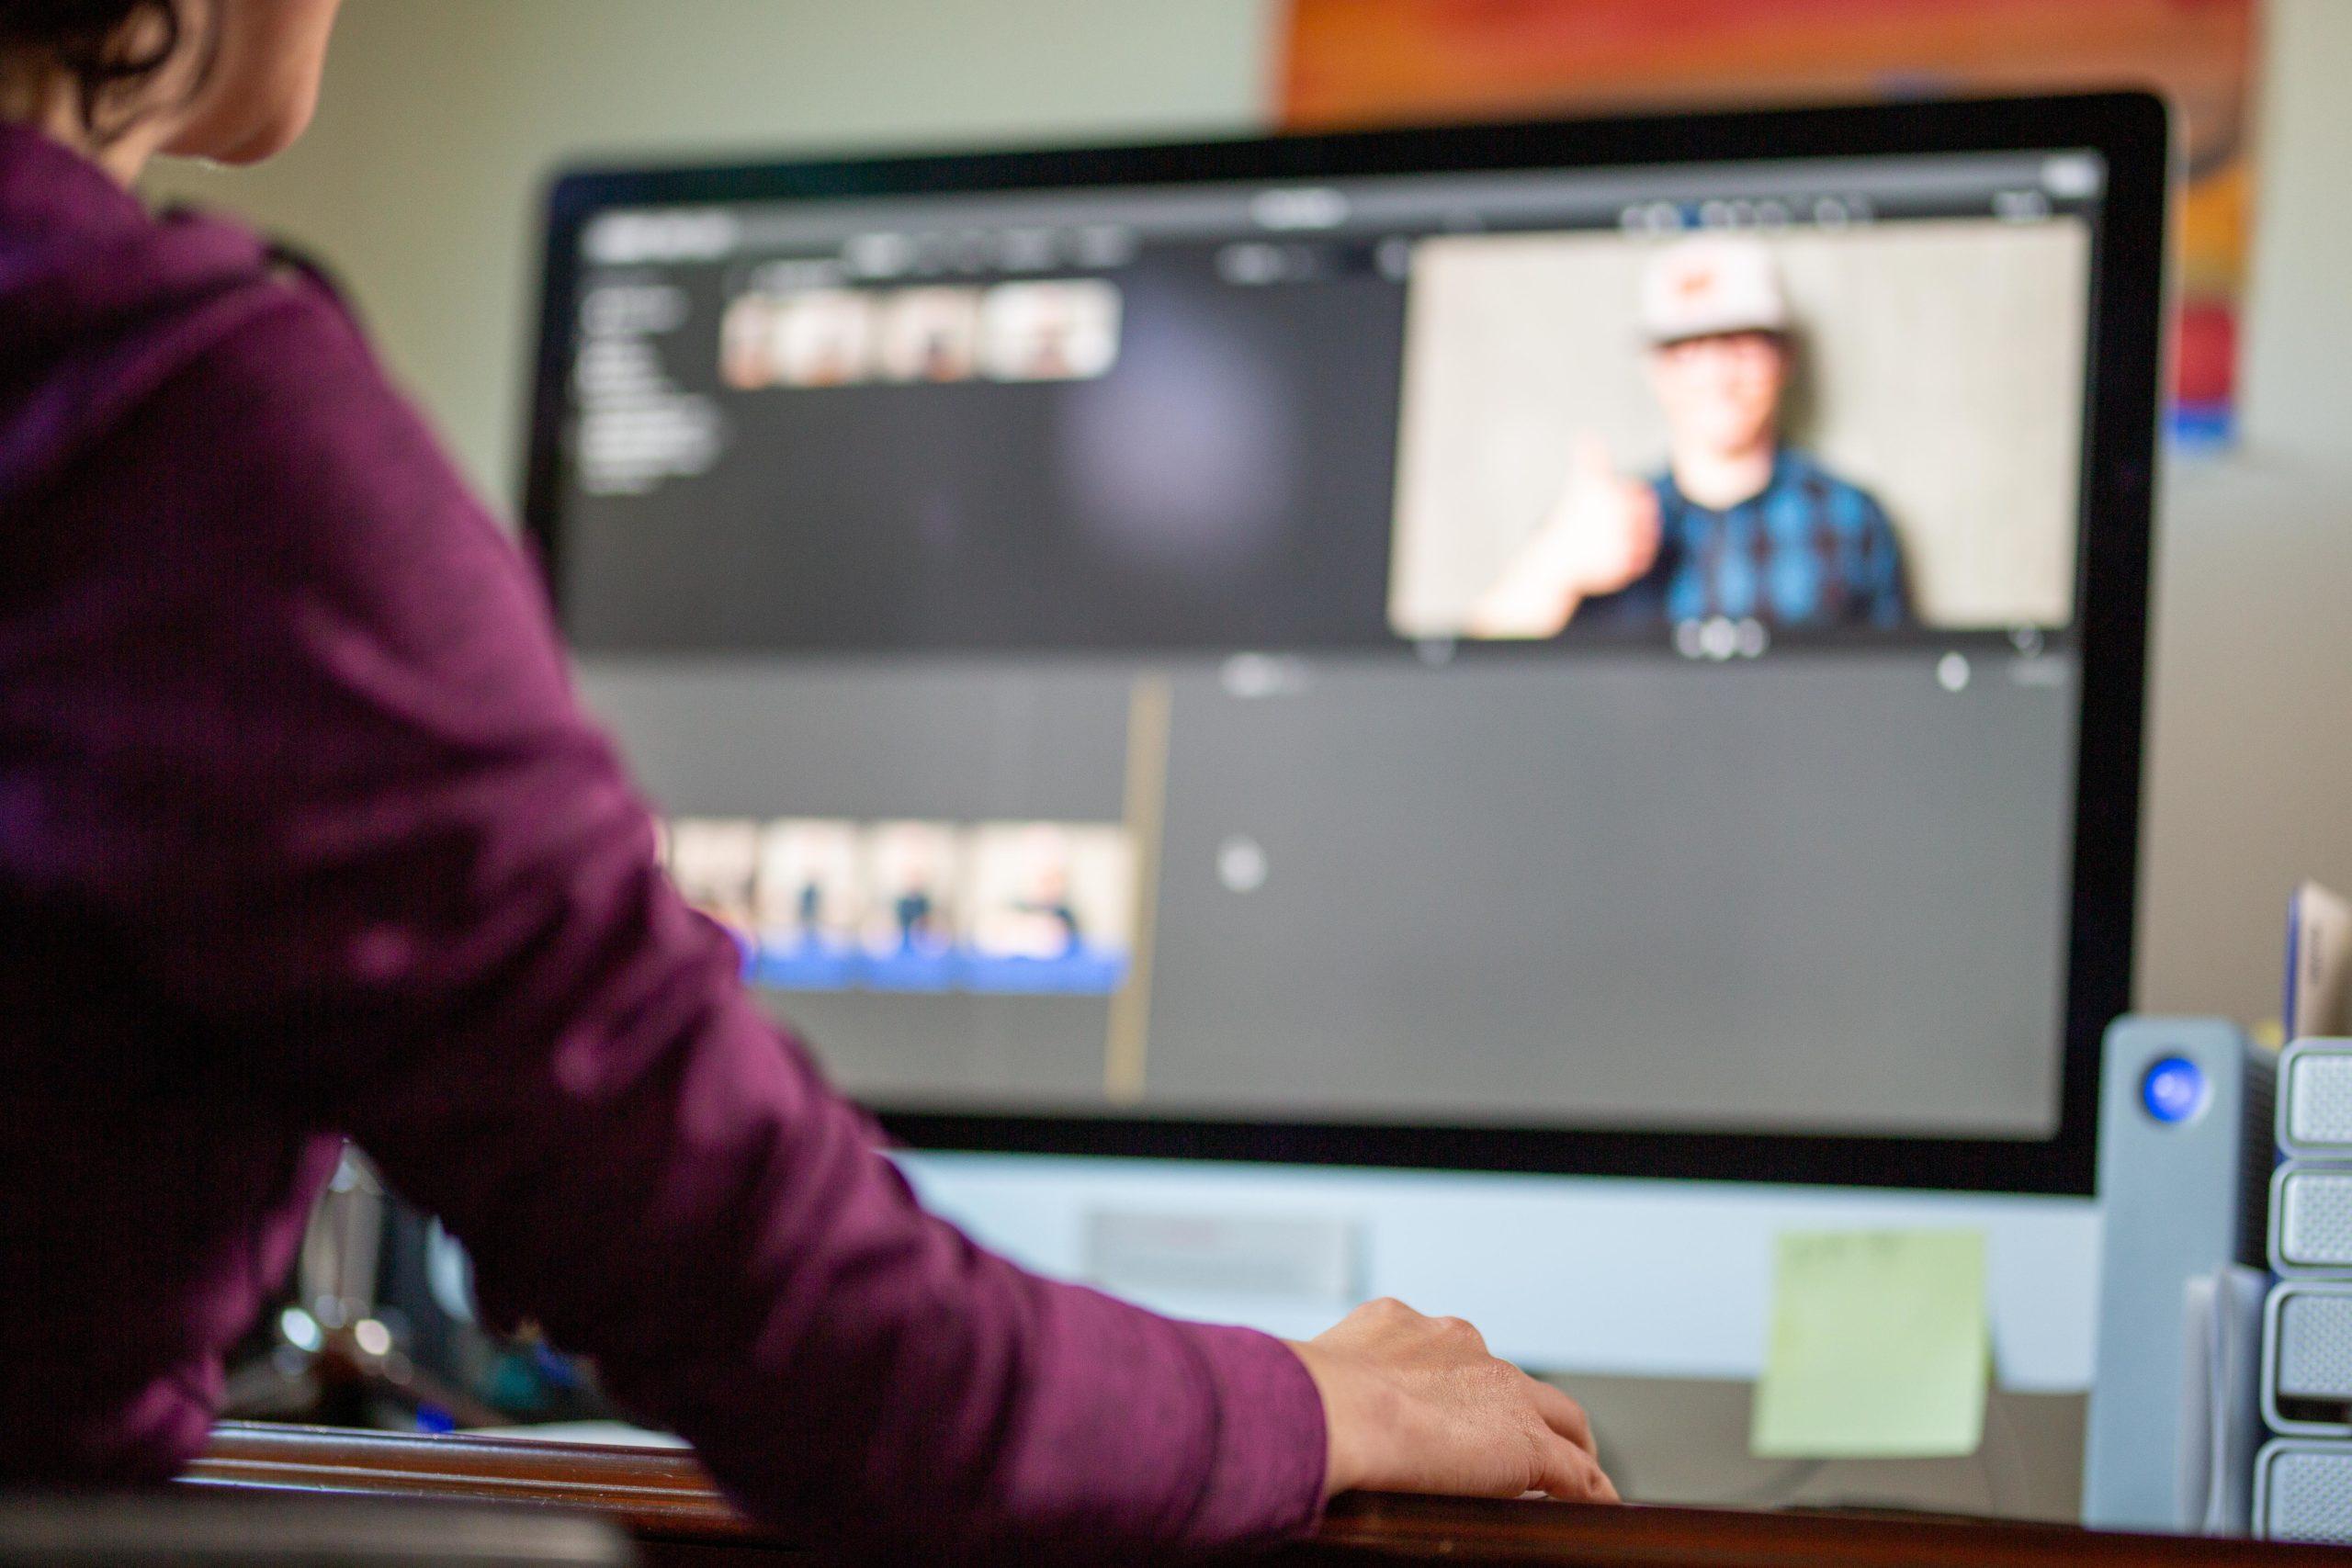 iMovie on Mac: Importing, Editing & Exporting